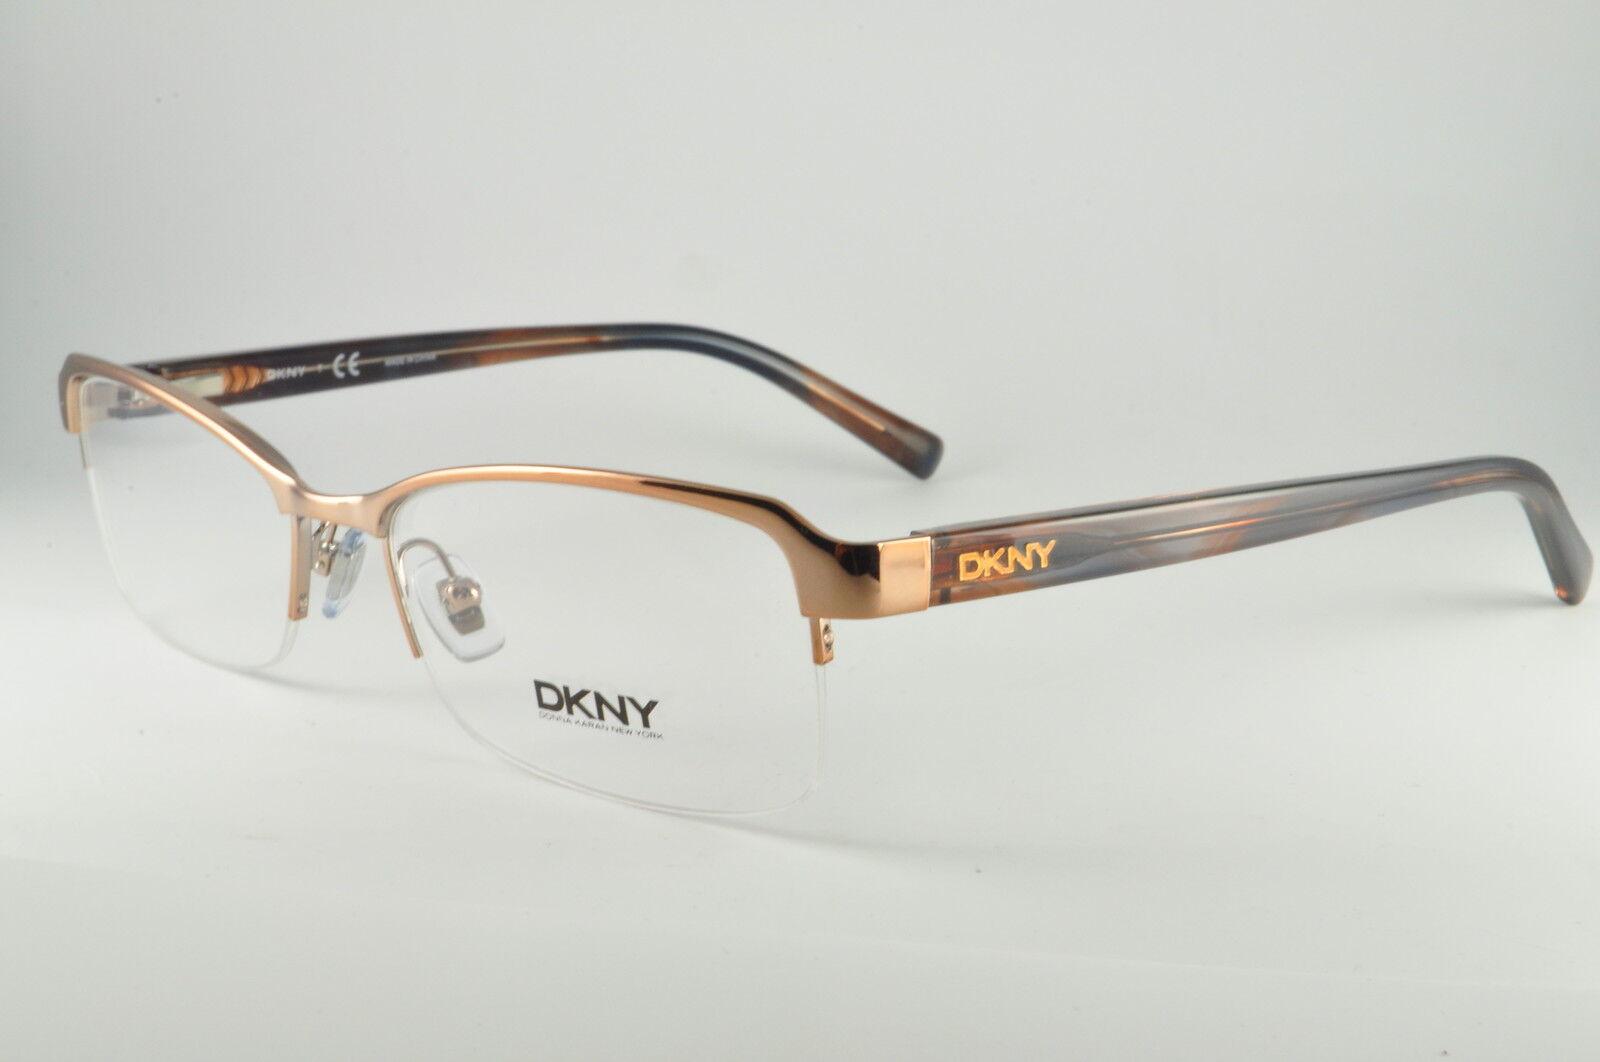 7afd0033e3 Dkny Eyeglasses DY5639 1015 Copper